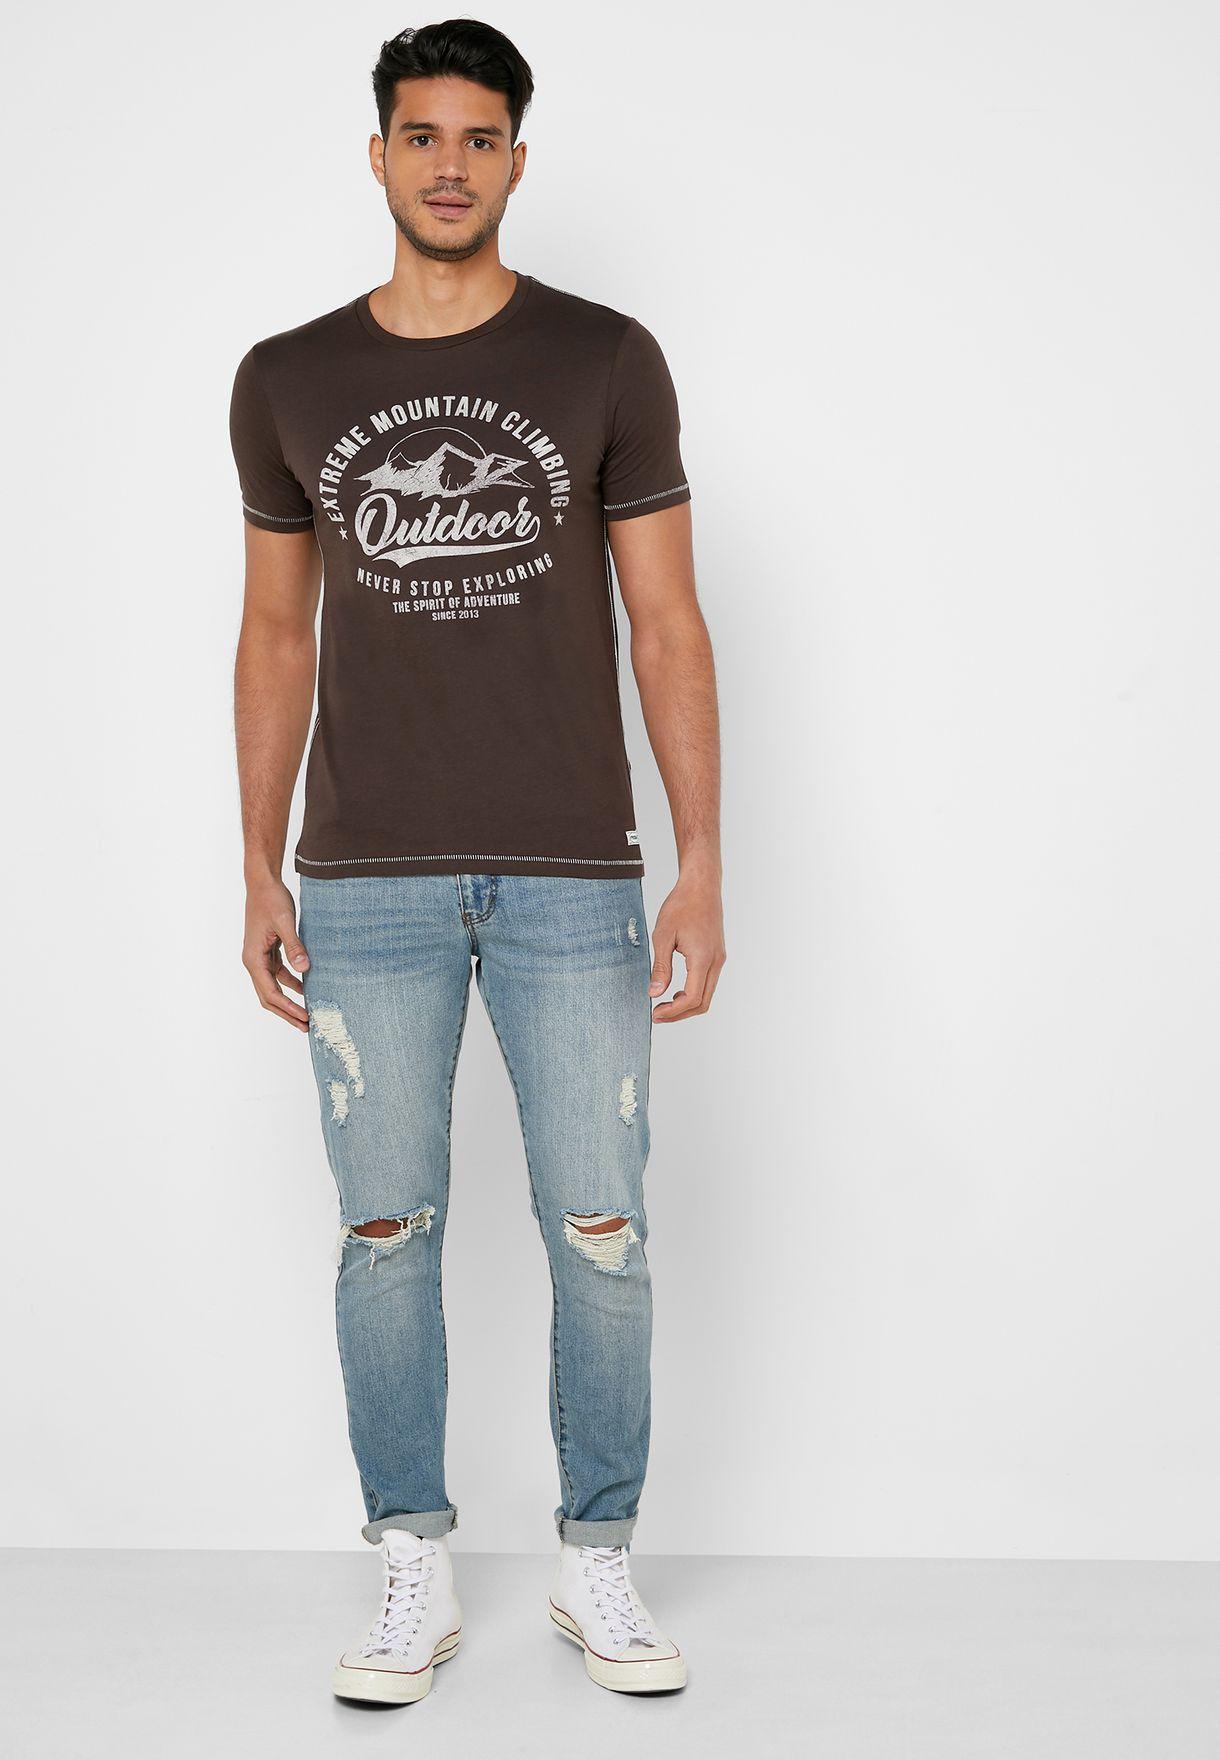 Adrian Crew Neck T-Shirt